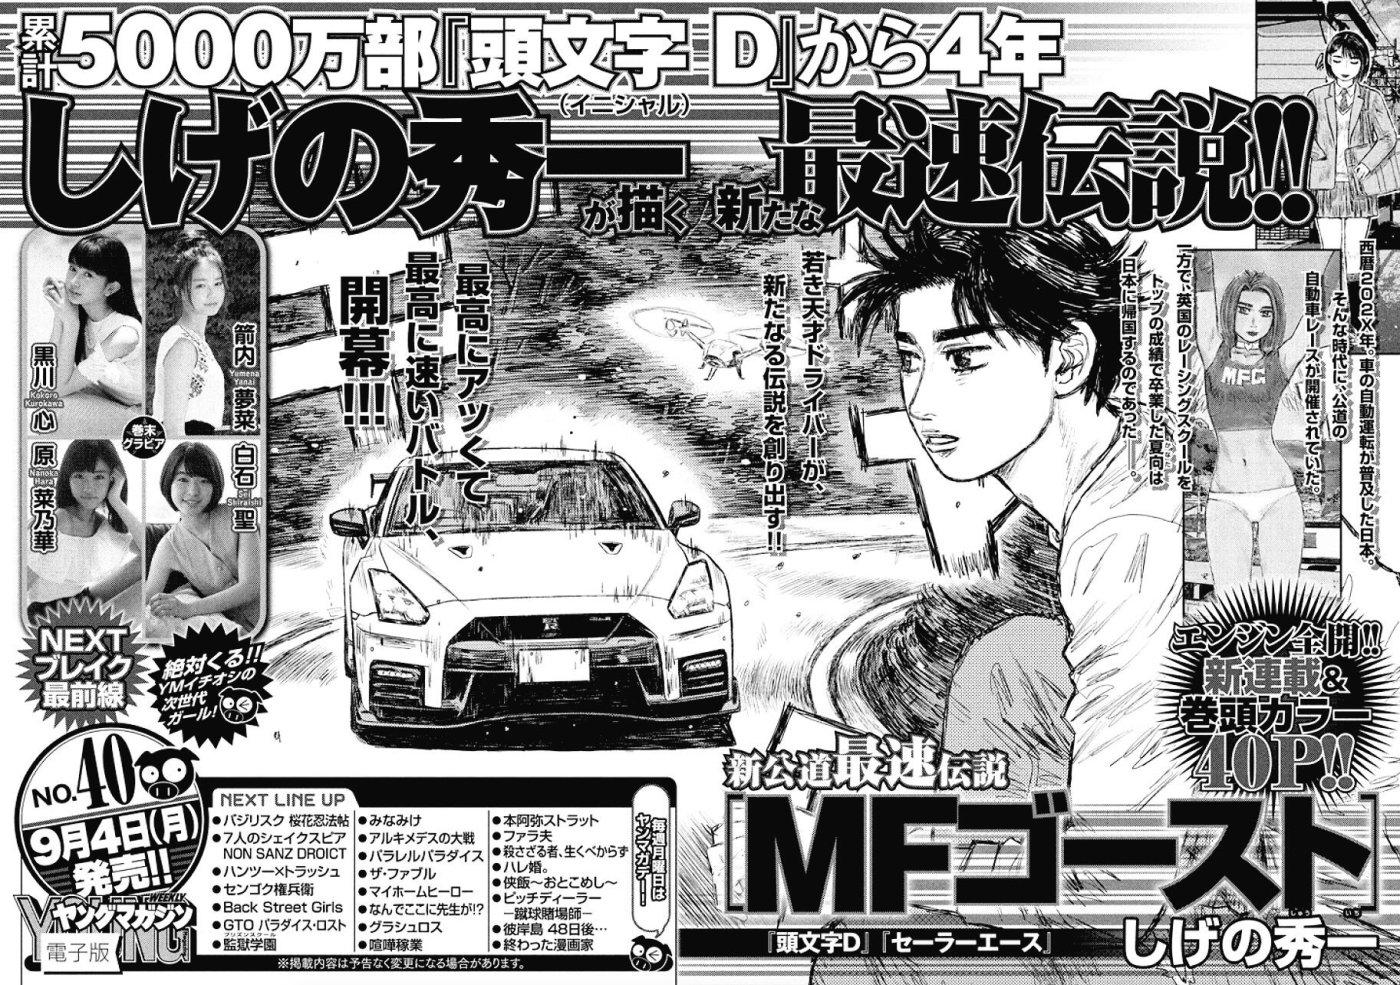 MF Ghost (MFゴースト) de Shuichi Shigeno